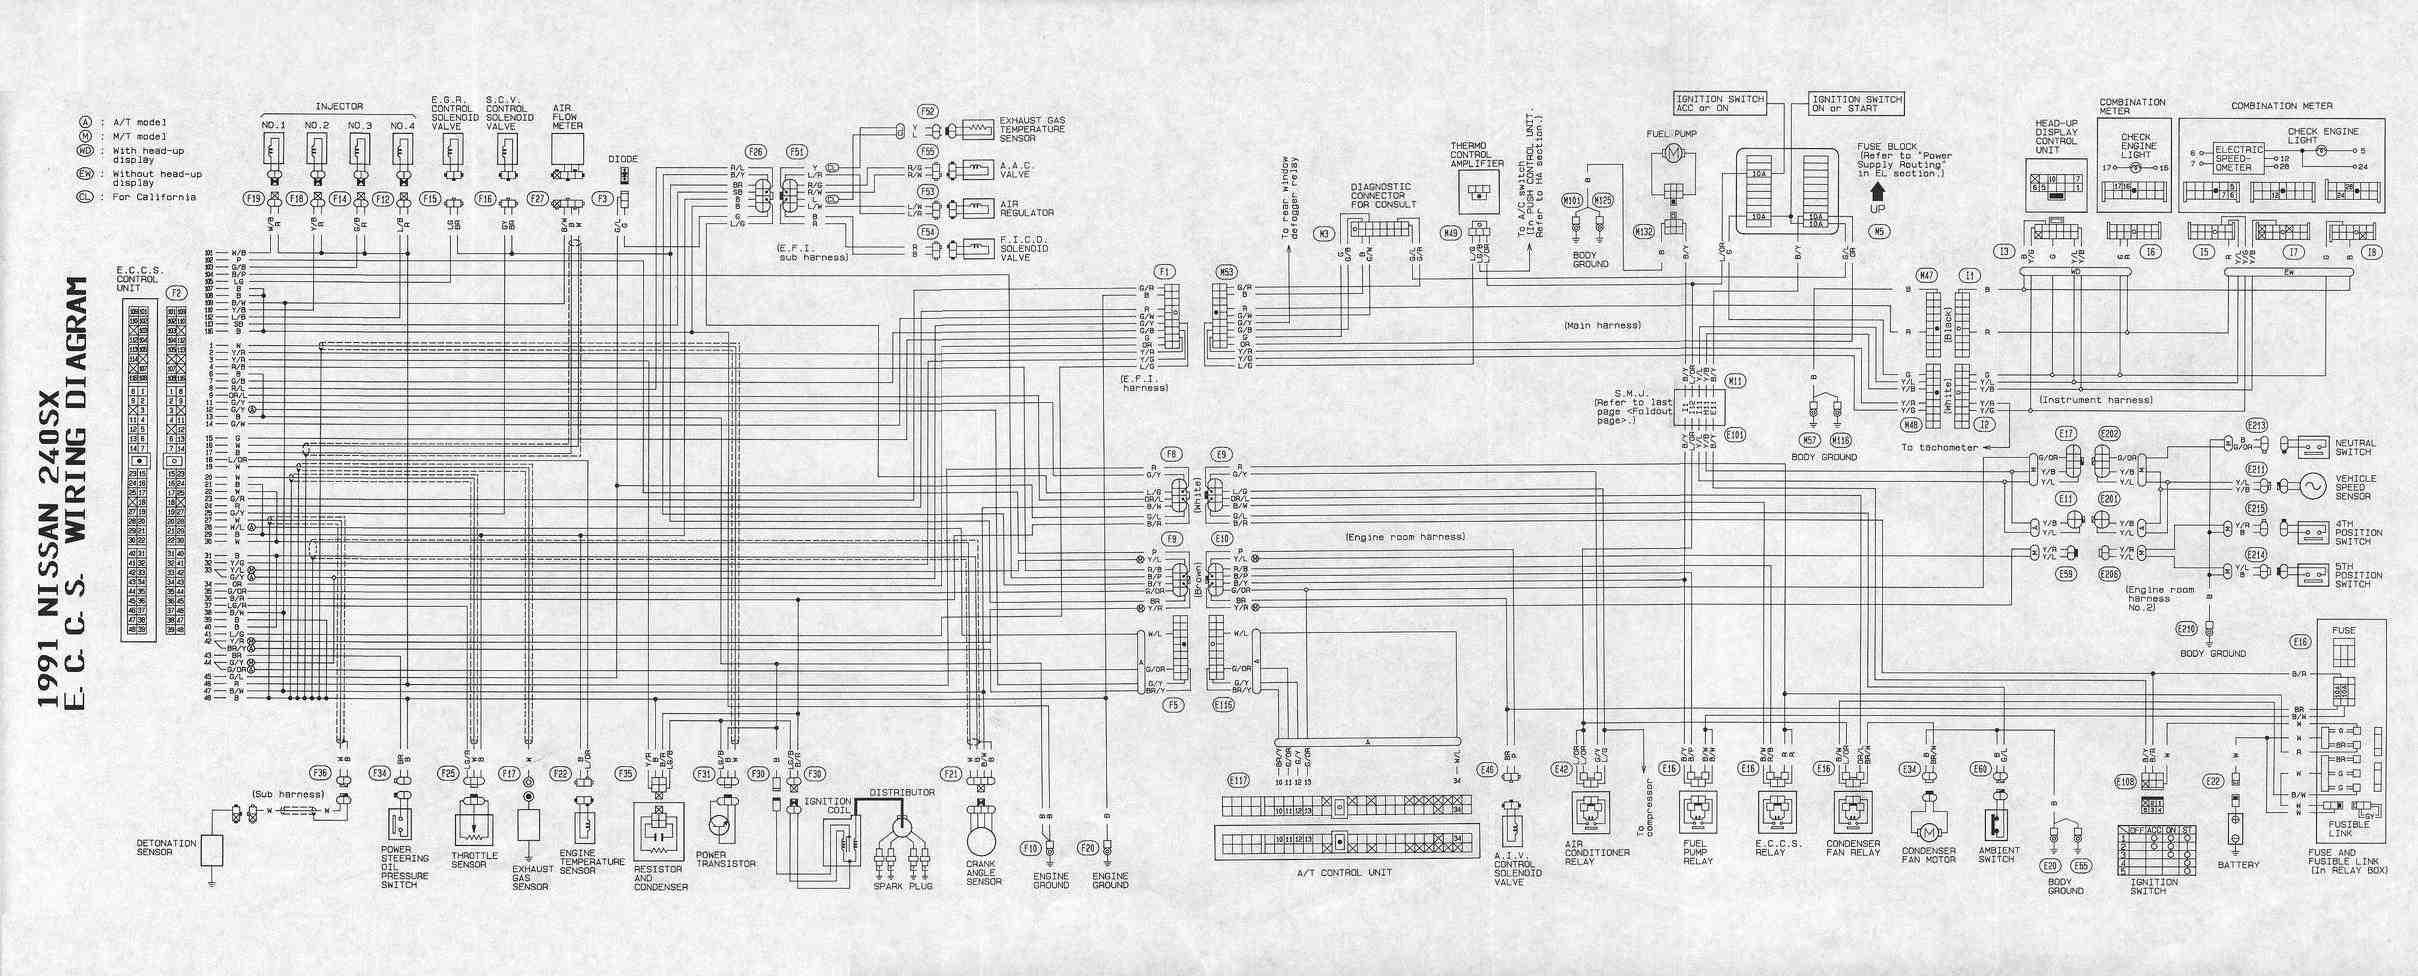 medium resolution of 1990 nissan 300zx ignition wiring diagram somurich com 300zx ignition coil wiring diagram 1990 nissan 300zx